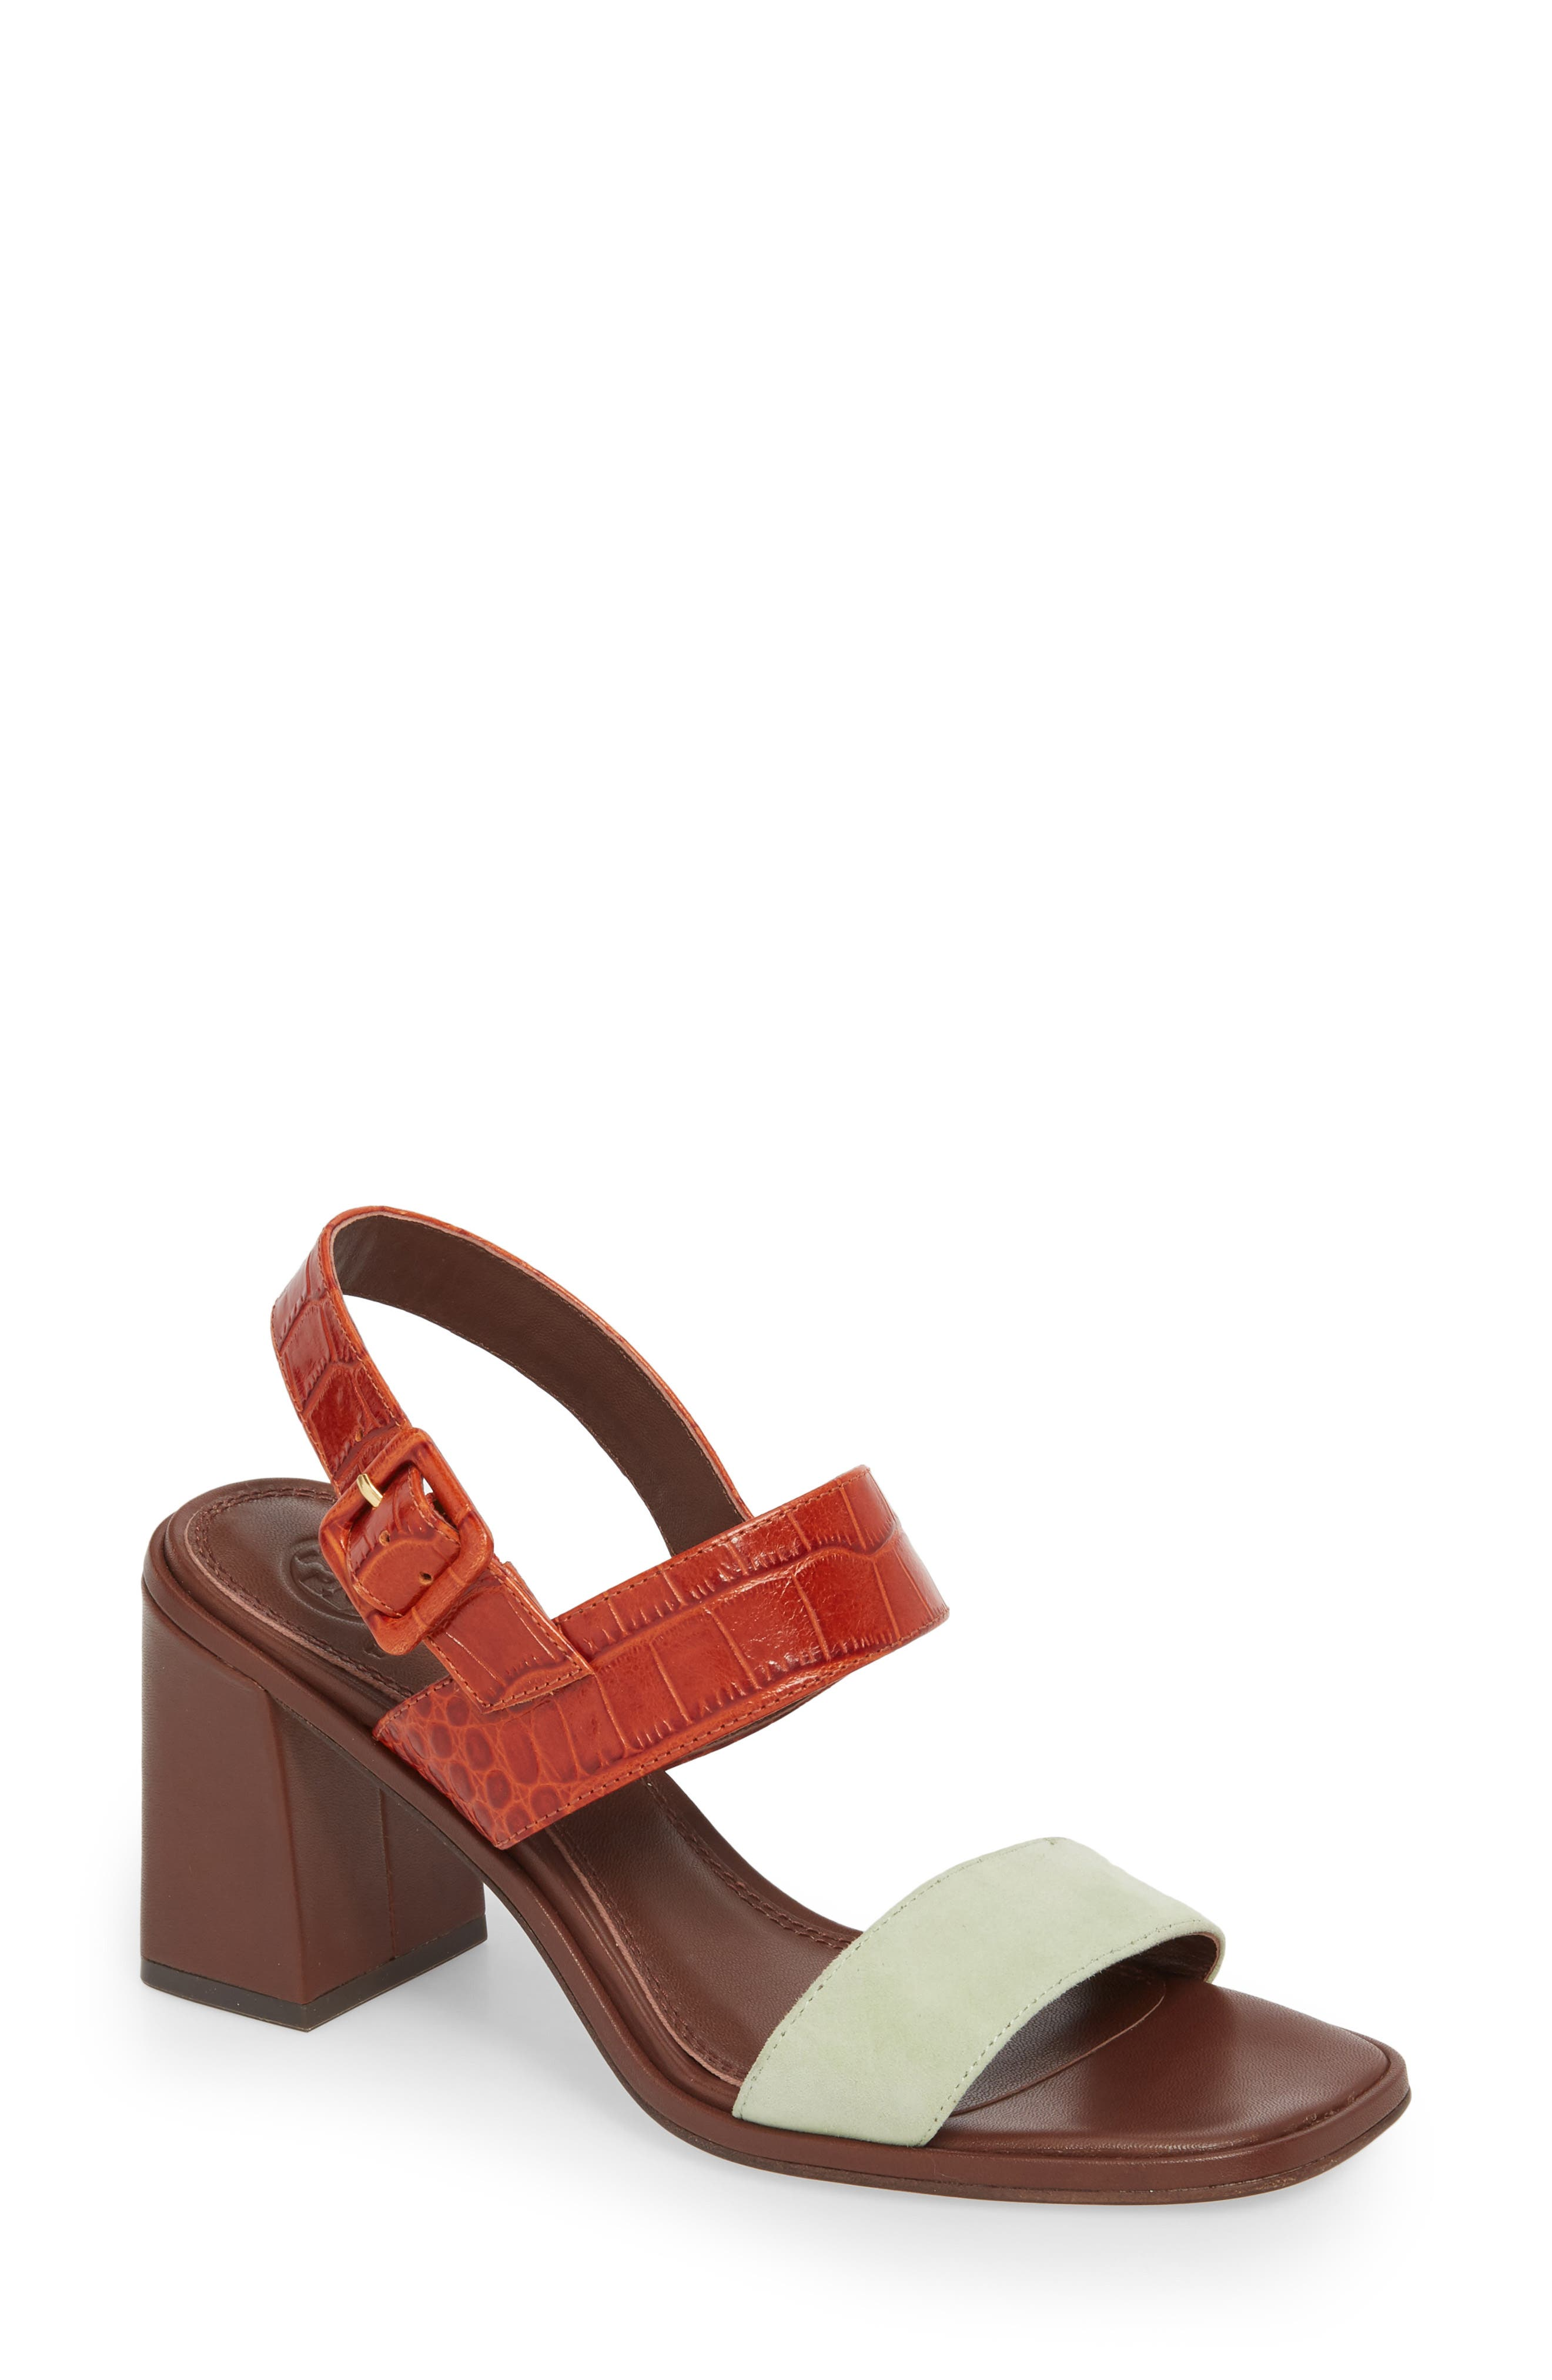 Tory Burch Delaney Double Strap Sandal (Women)